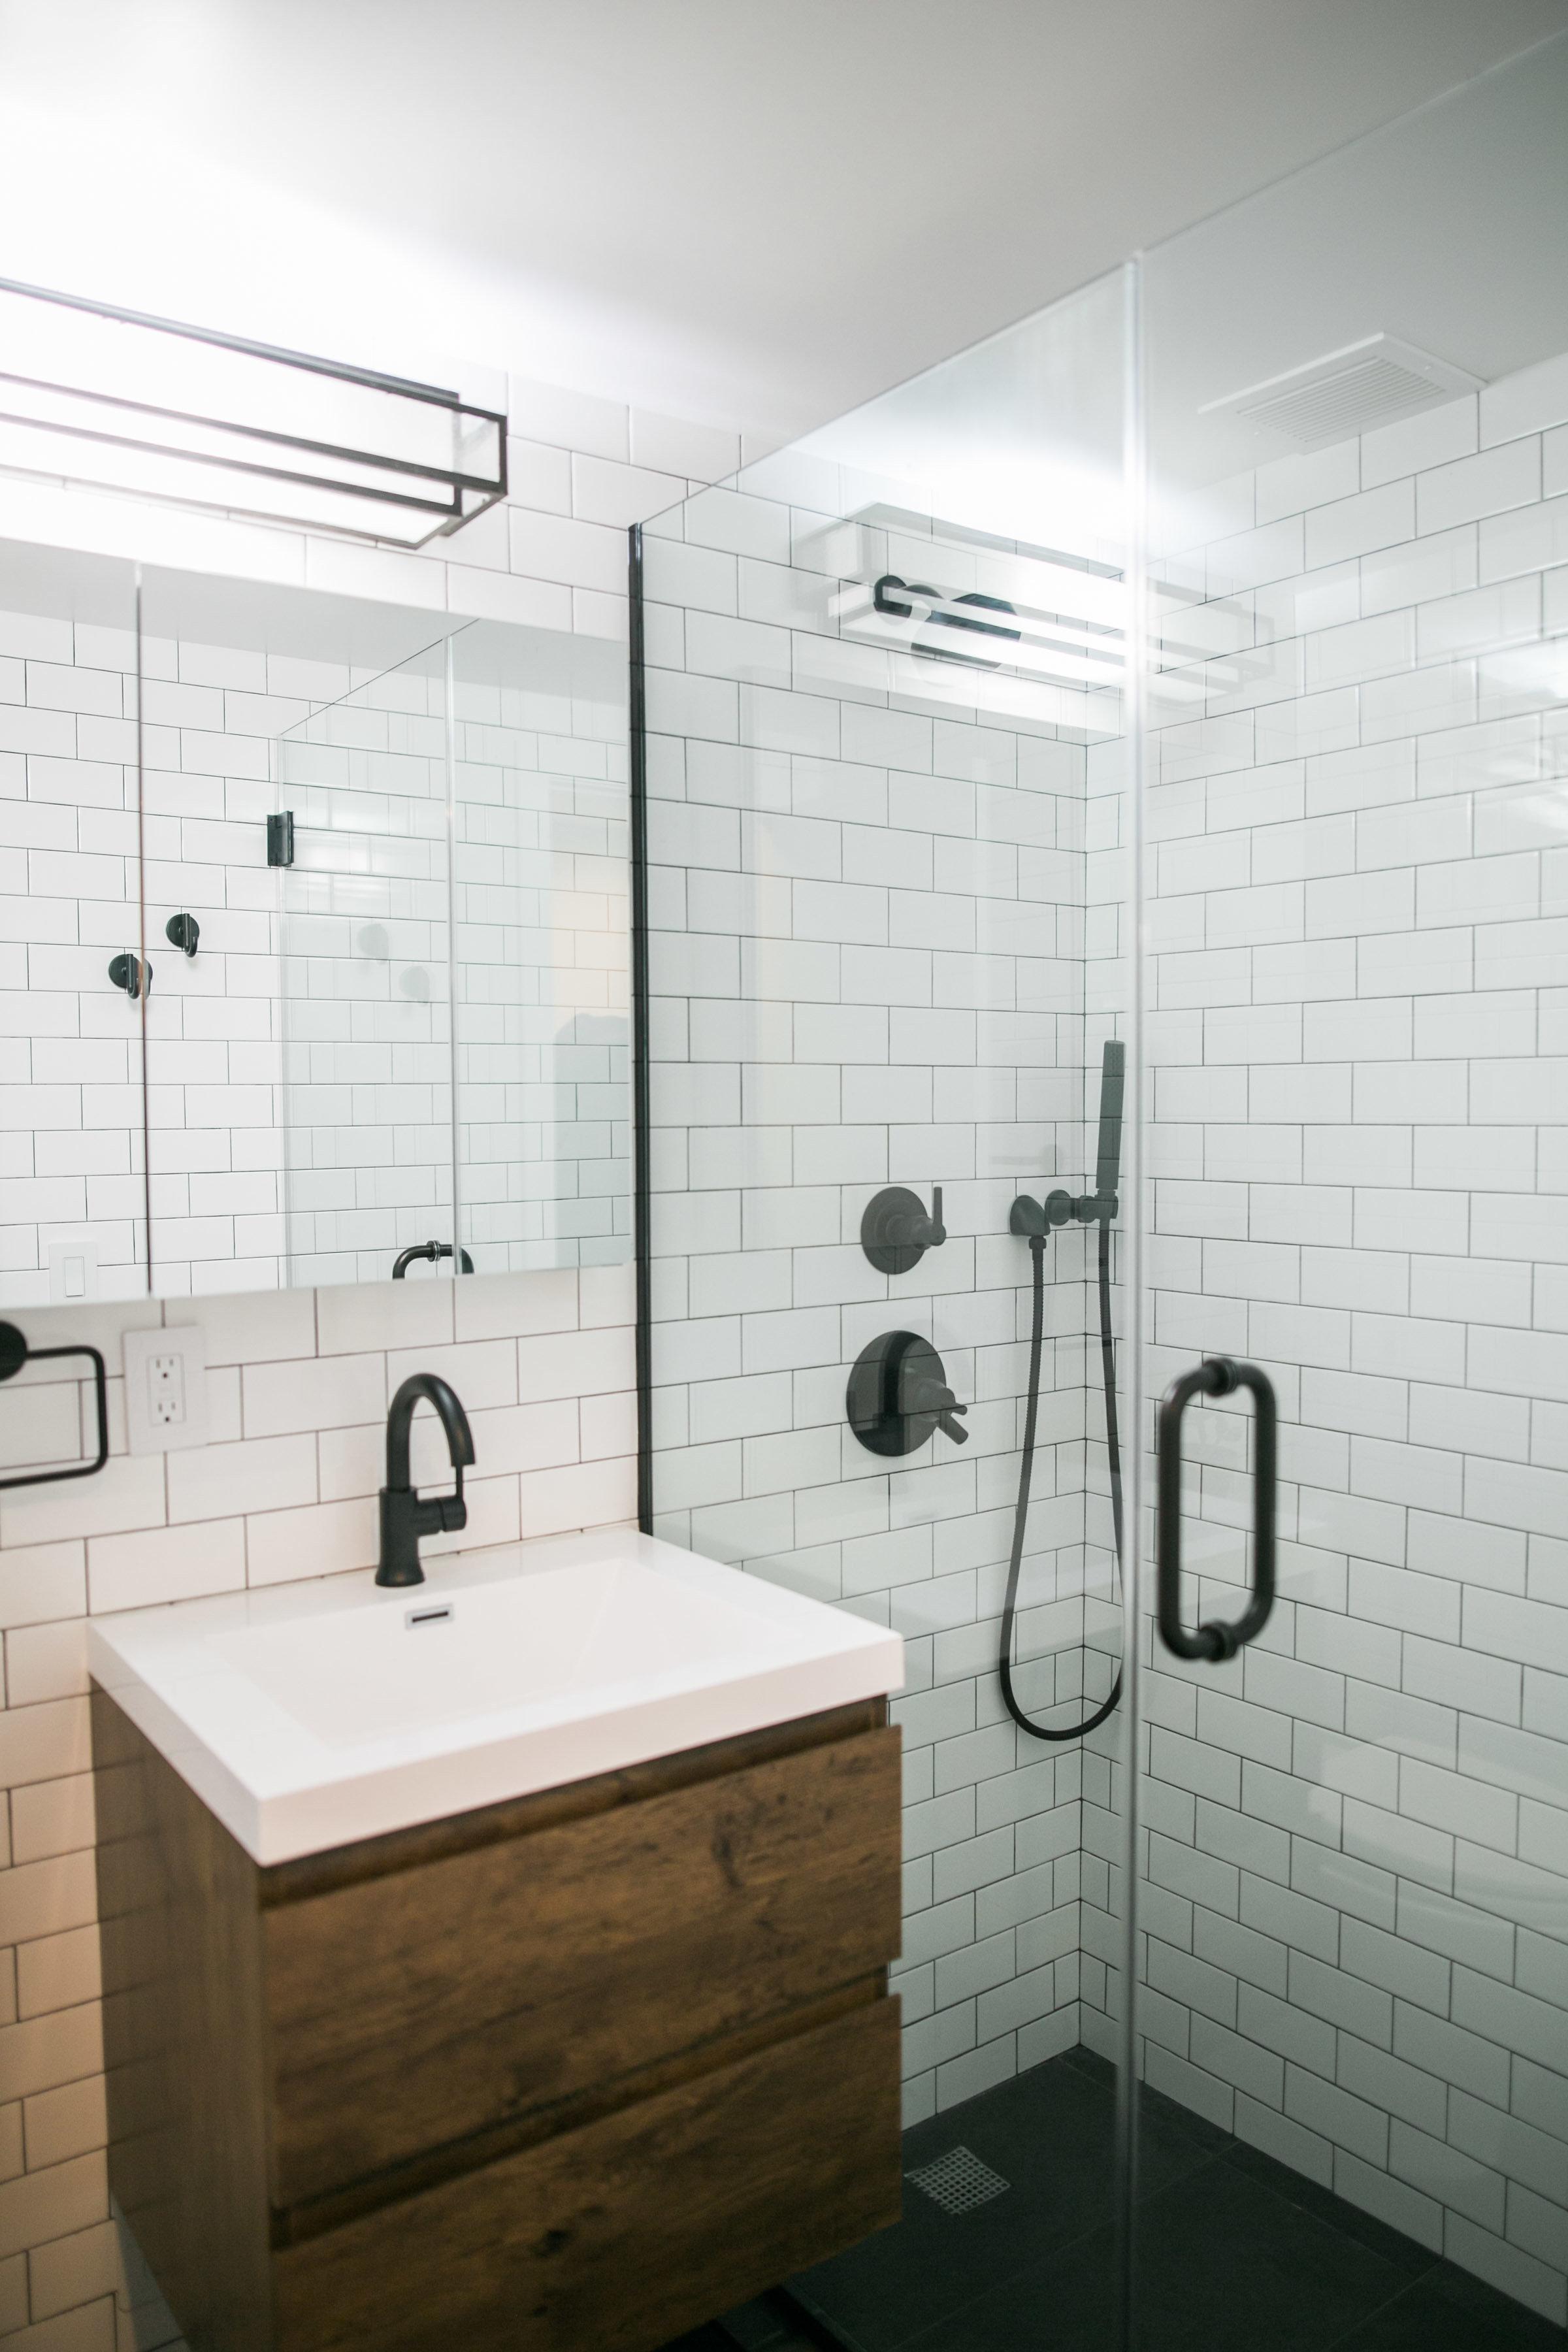 Location2_Bathroom_001.jpg